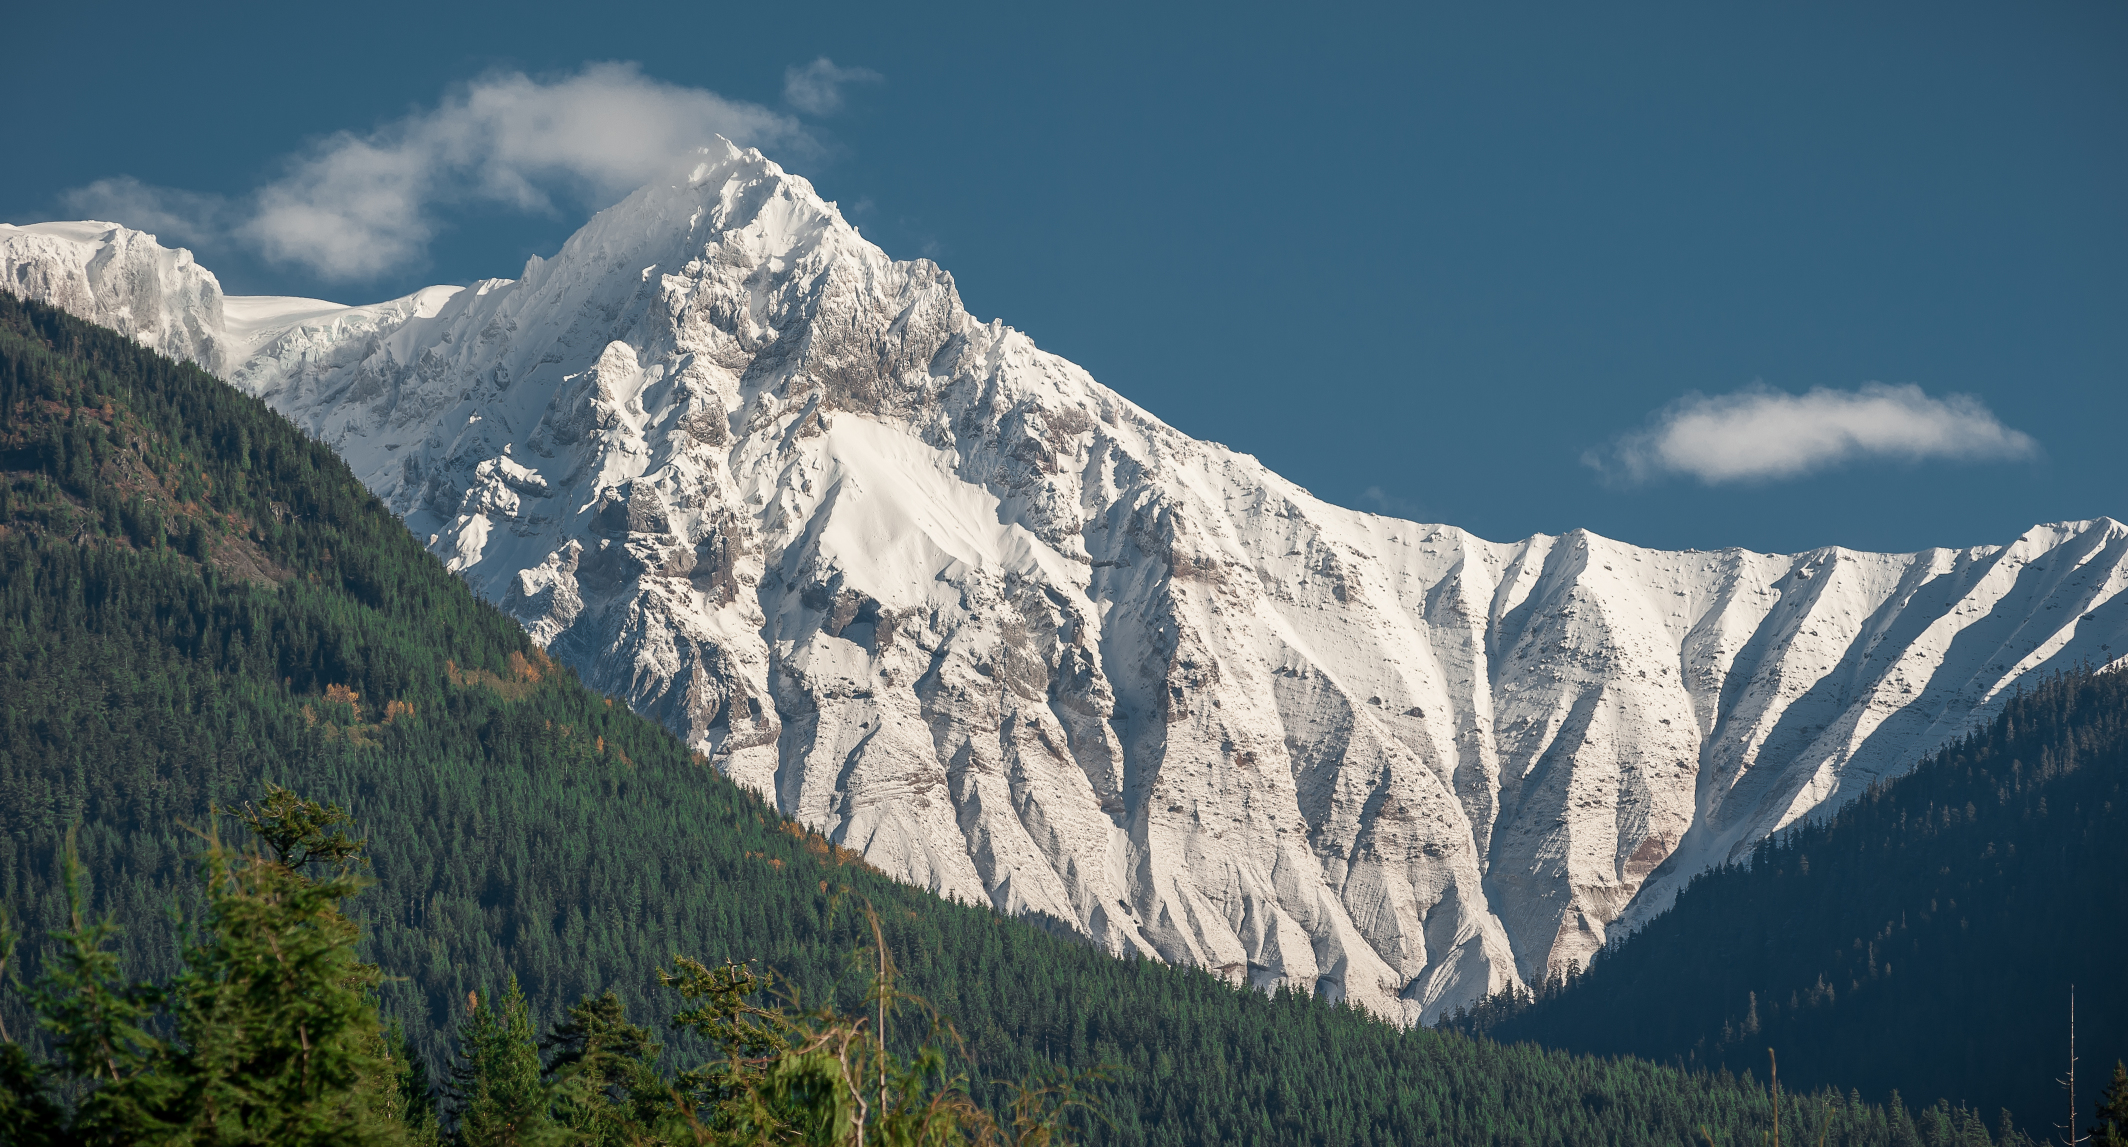 Mount_Garibaldi_S4rubdjP7CVjVKUYW9DscKr18q0ABlZBh_rgb_s.jpg